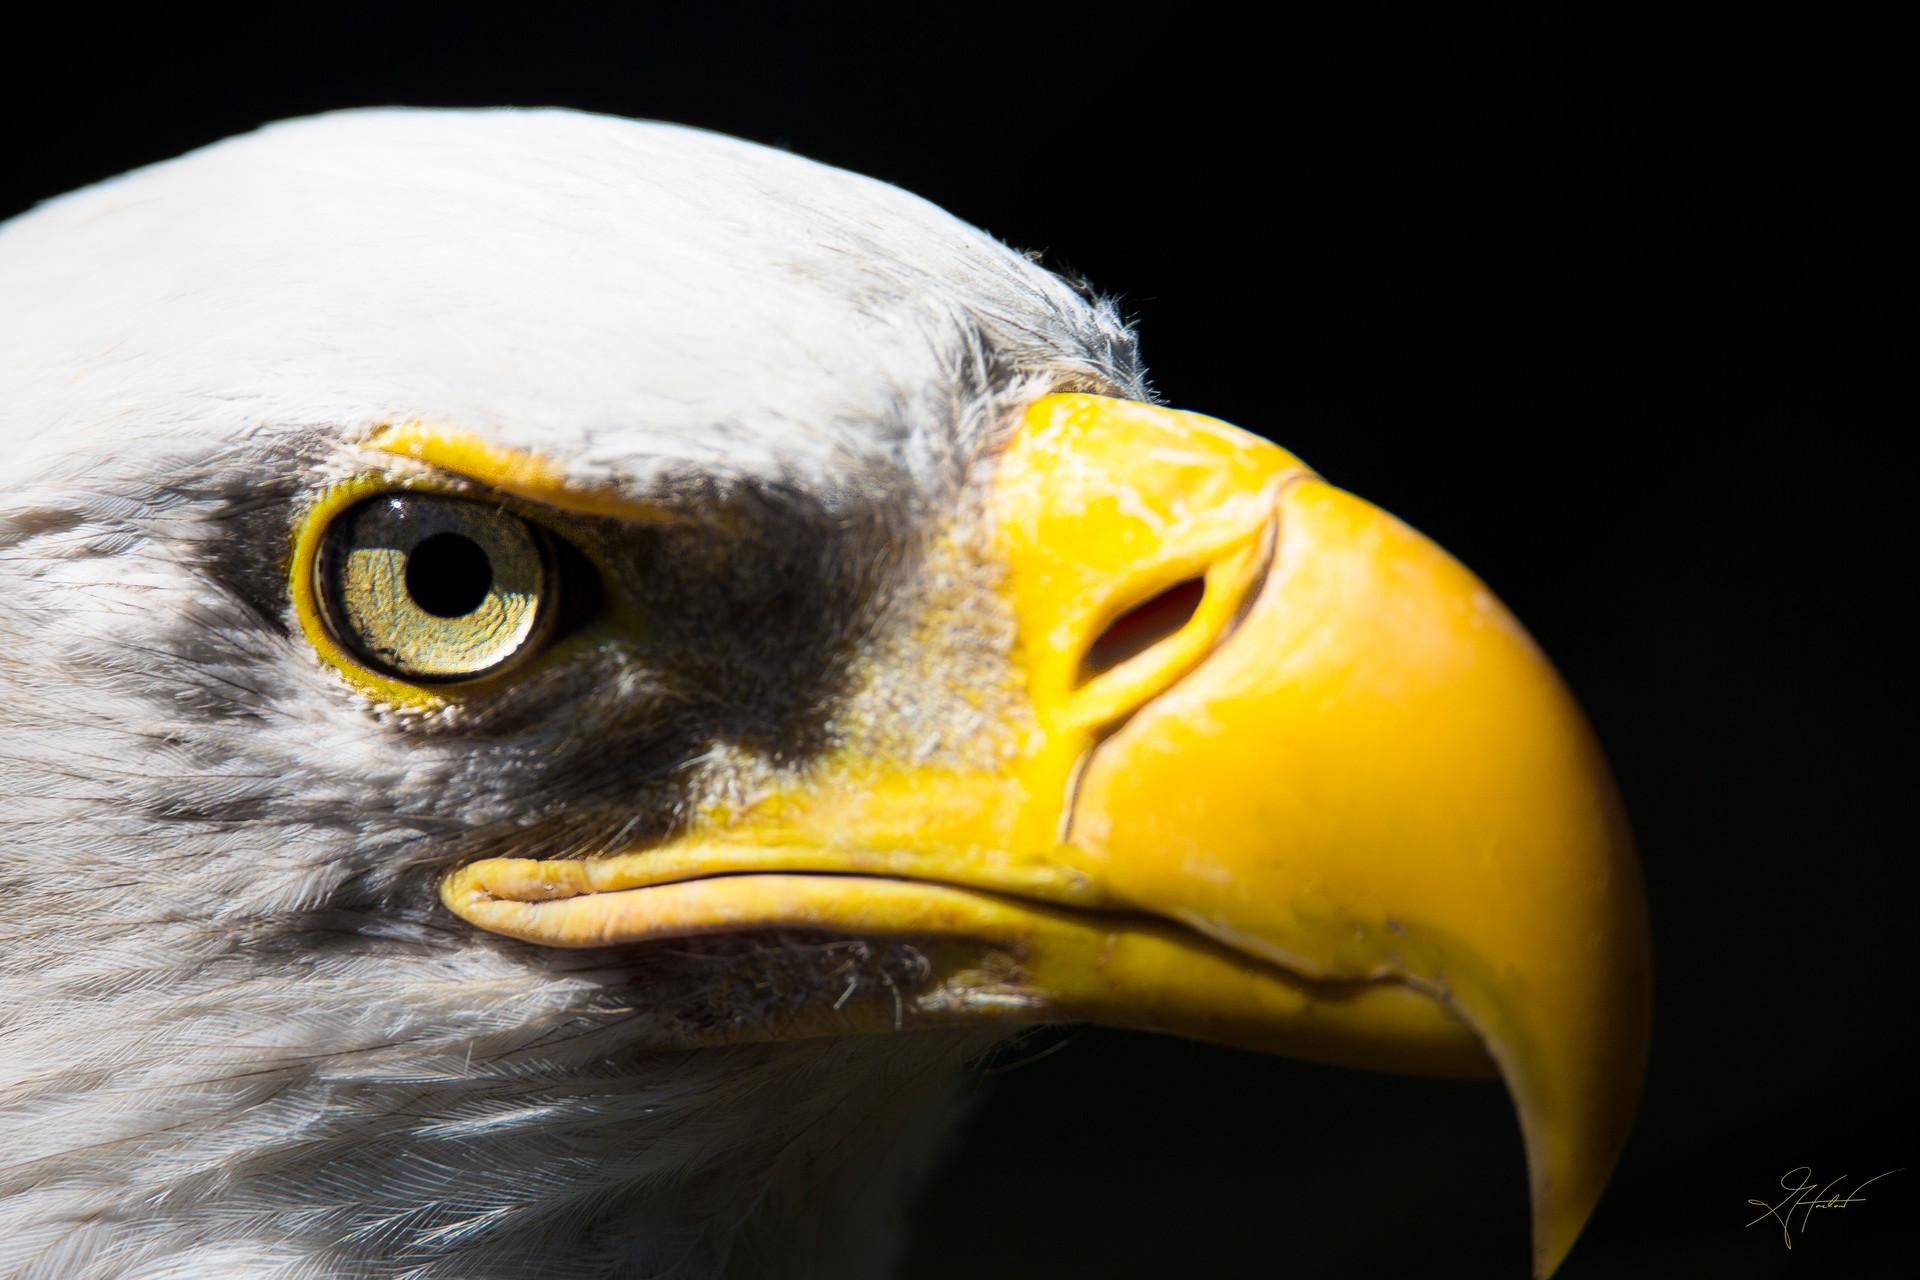 Greg Harlow Media Photography